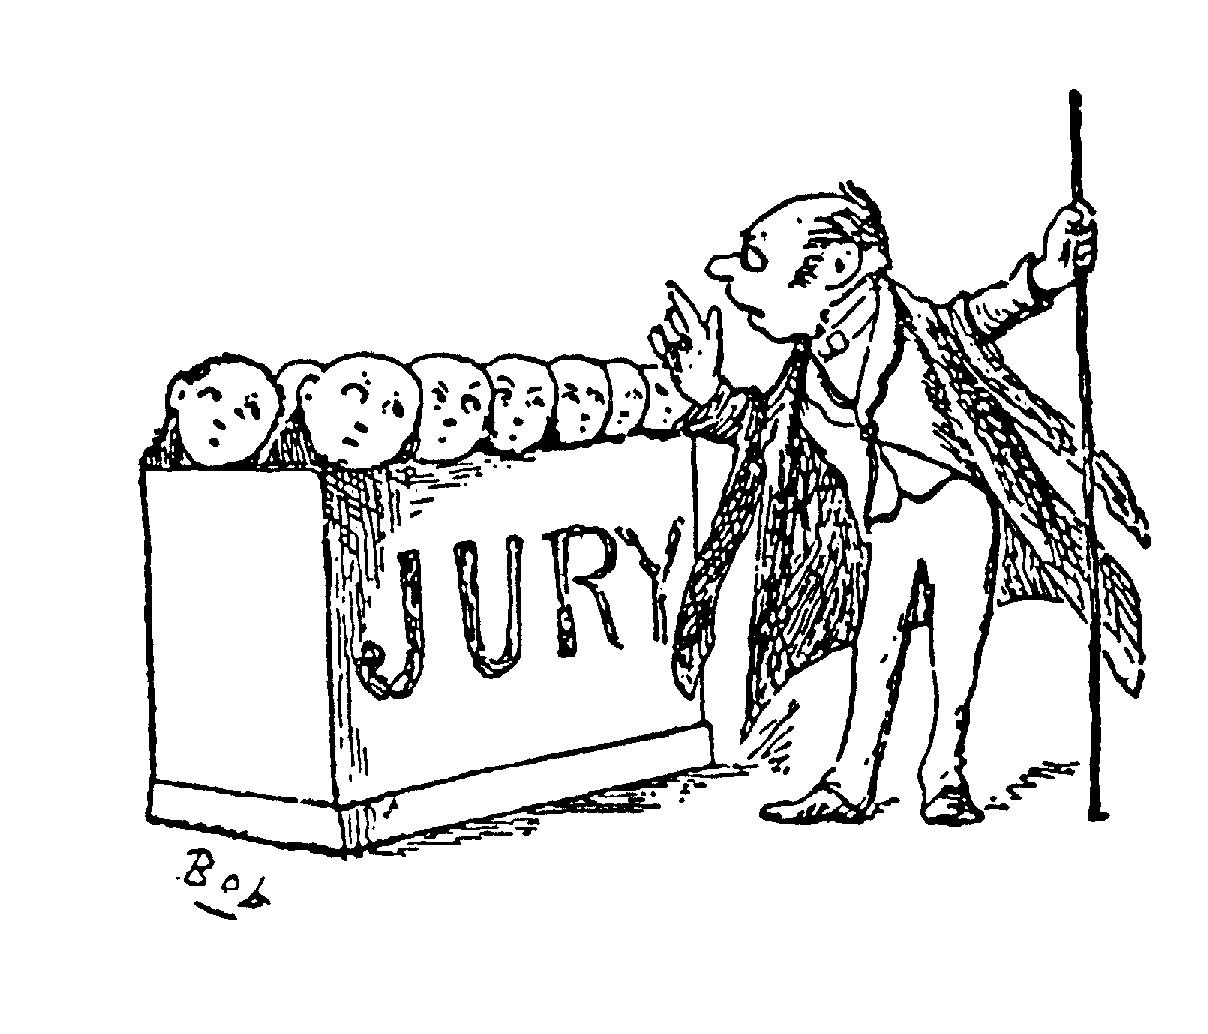 bill of rights by saima arina infographic Sai Maa 2017 trial by jury